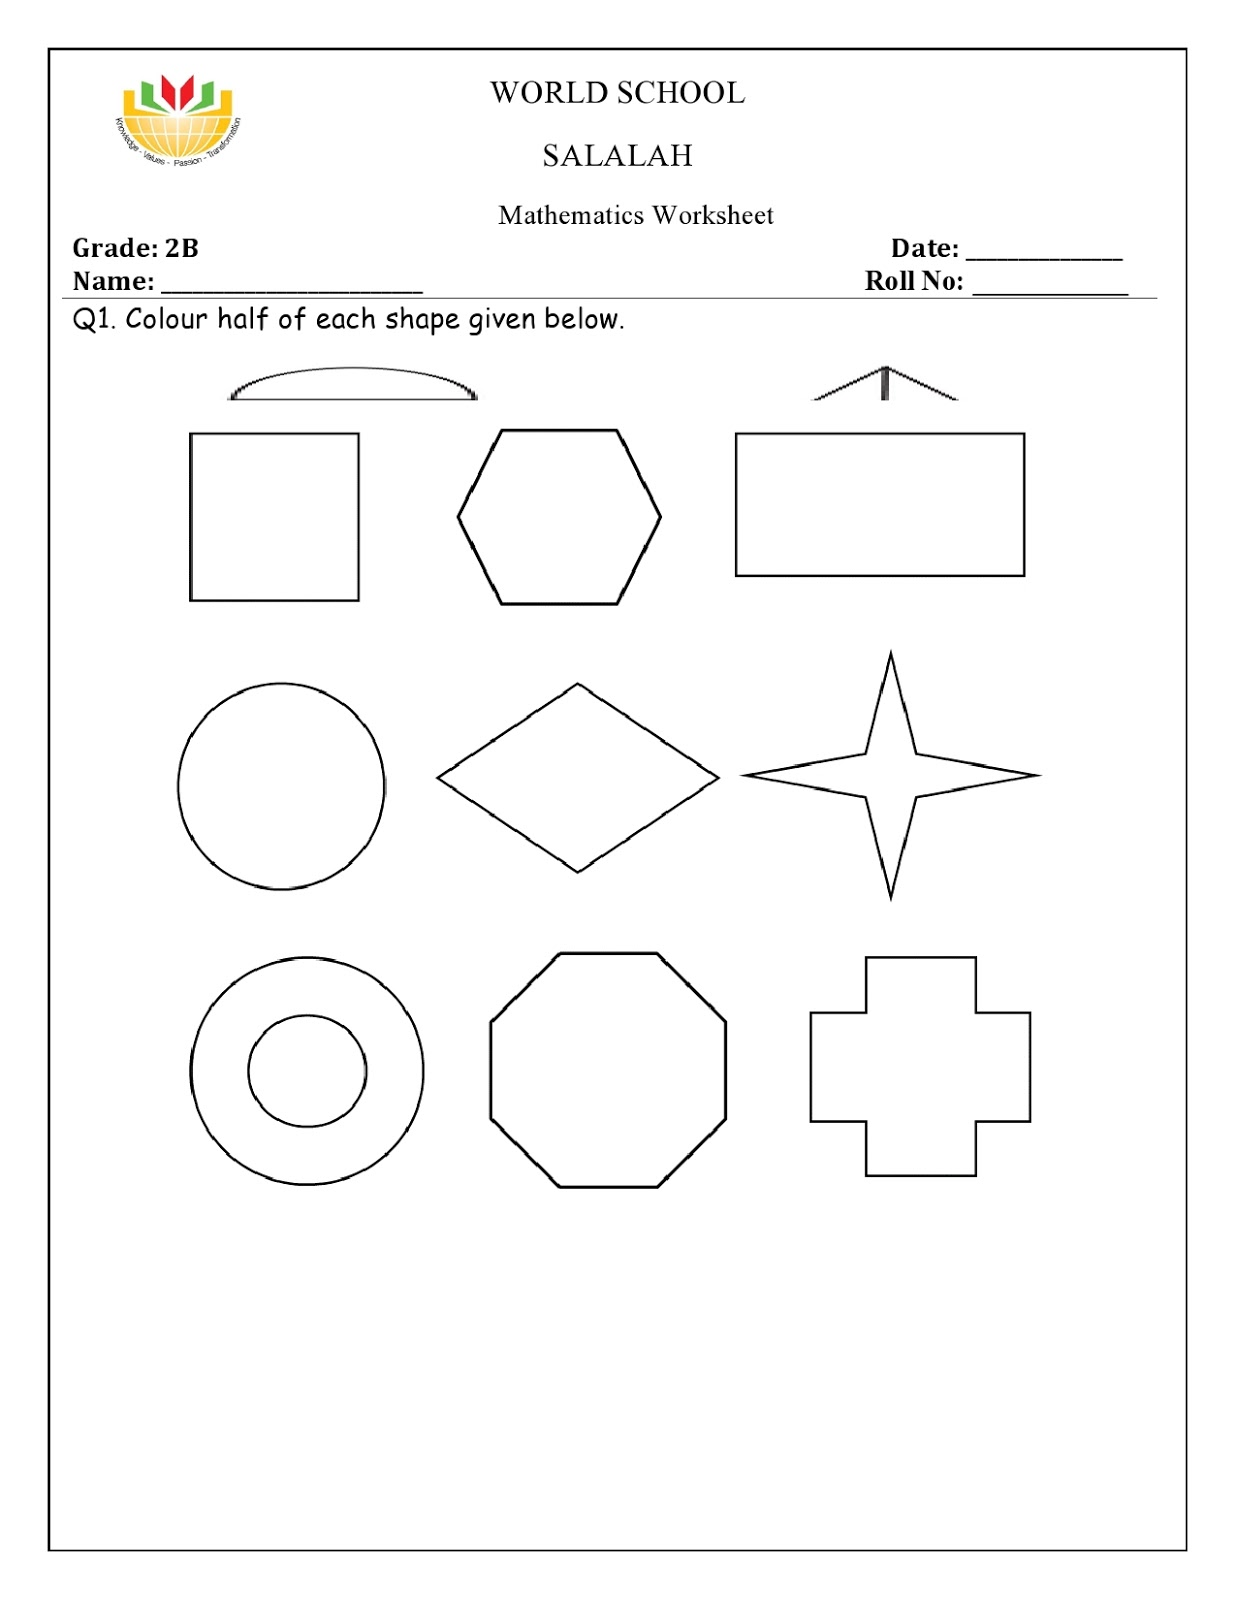 Birla World School Oman Homework For Grade 2 As On 04 01